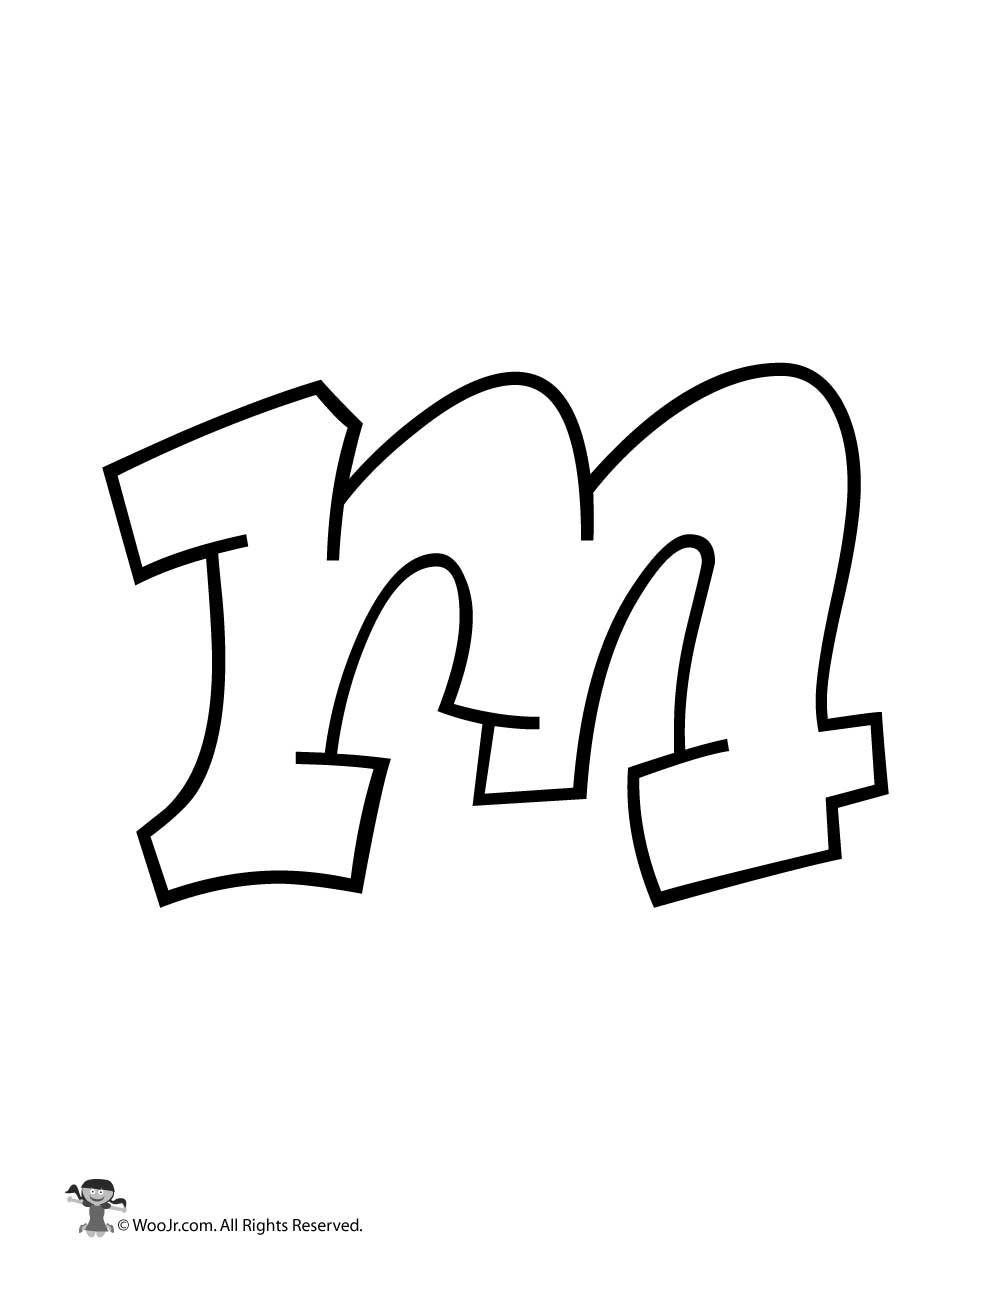 Graffiti Lowercase Letter M In 2020 Graffiti Lettering Graffiti